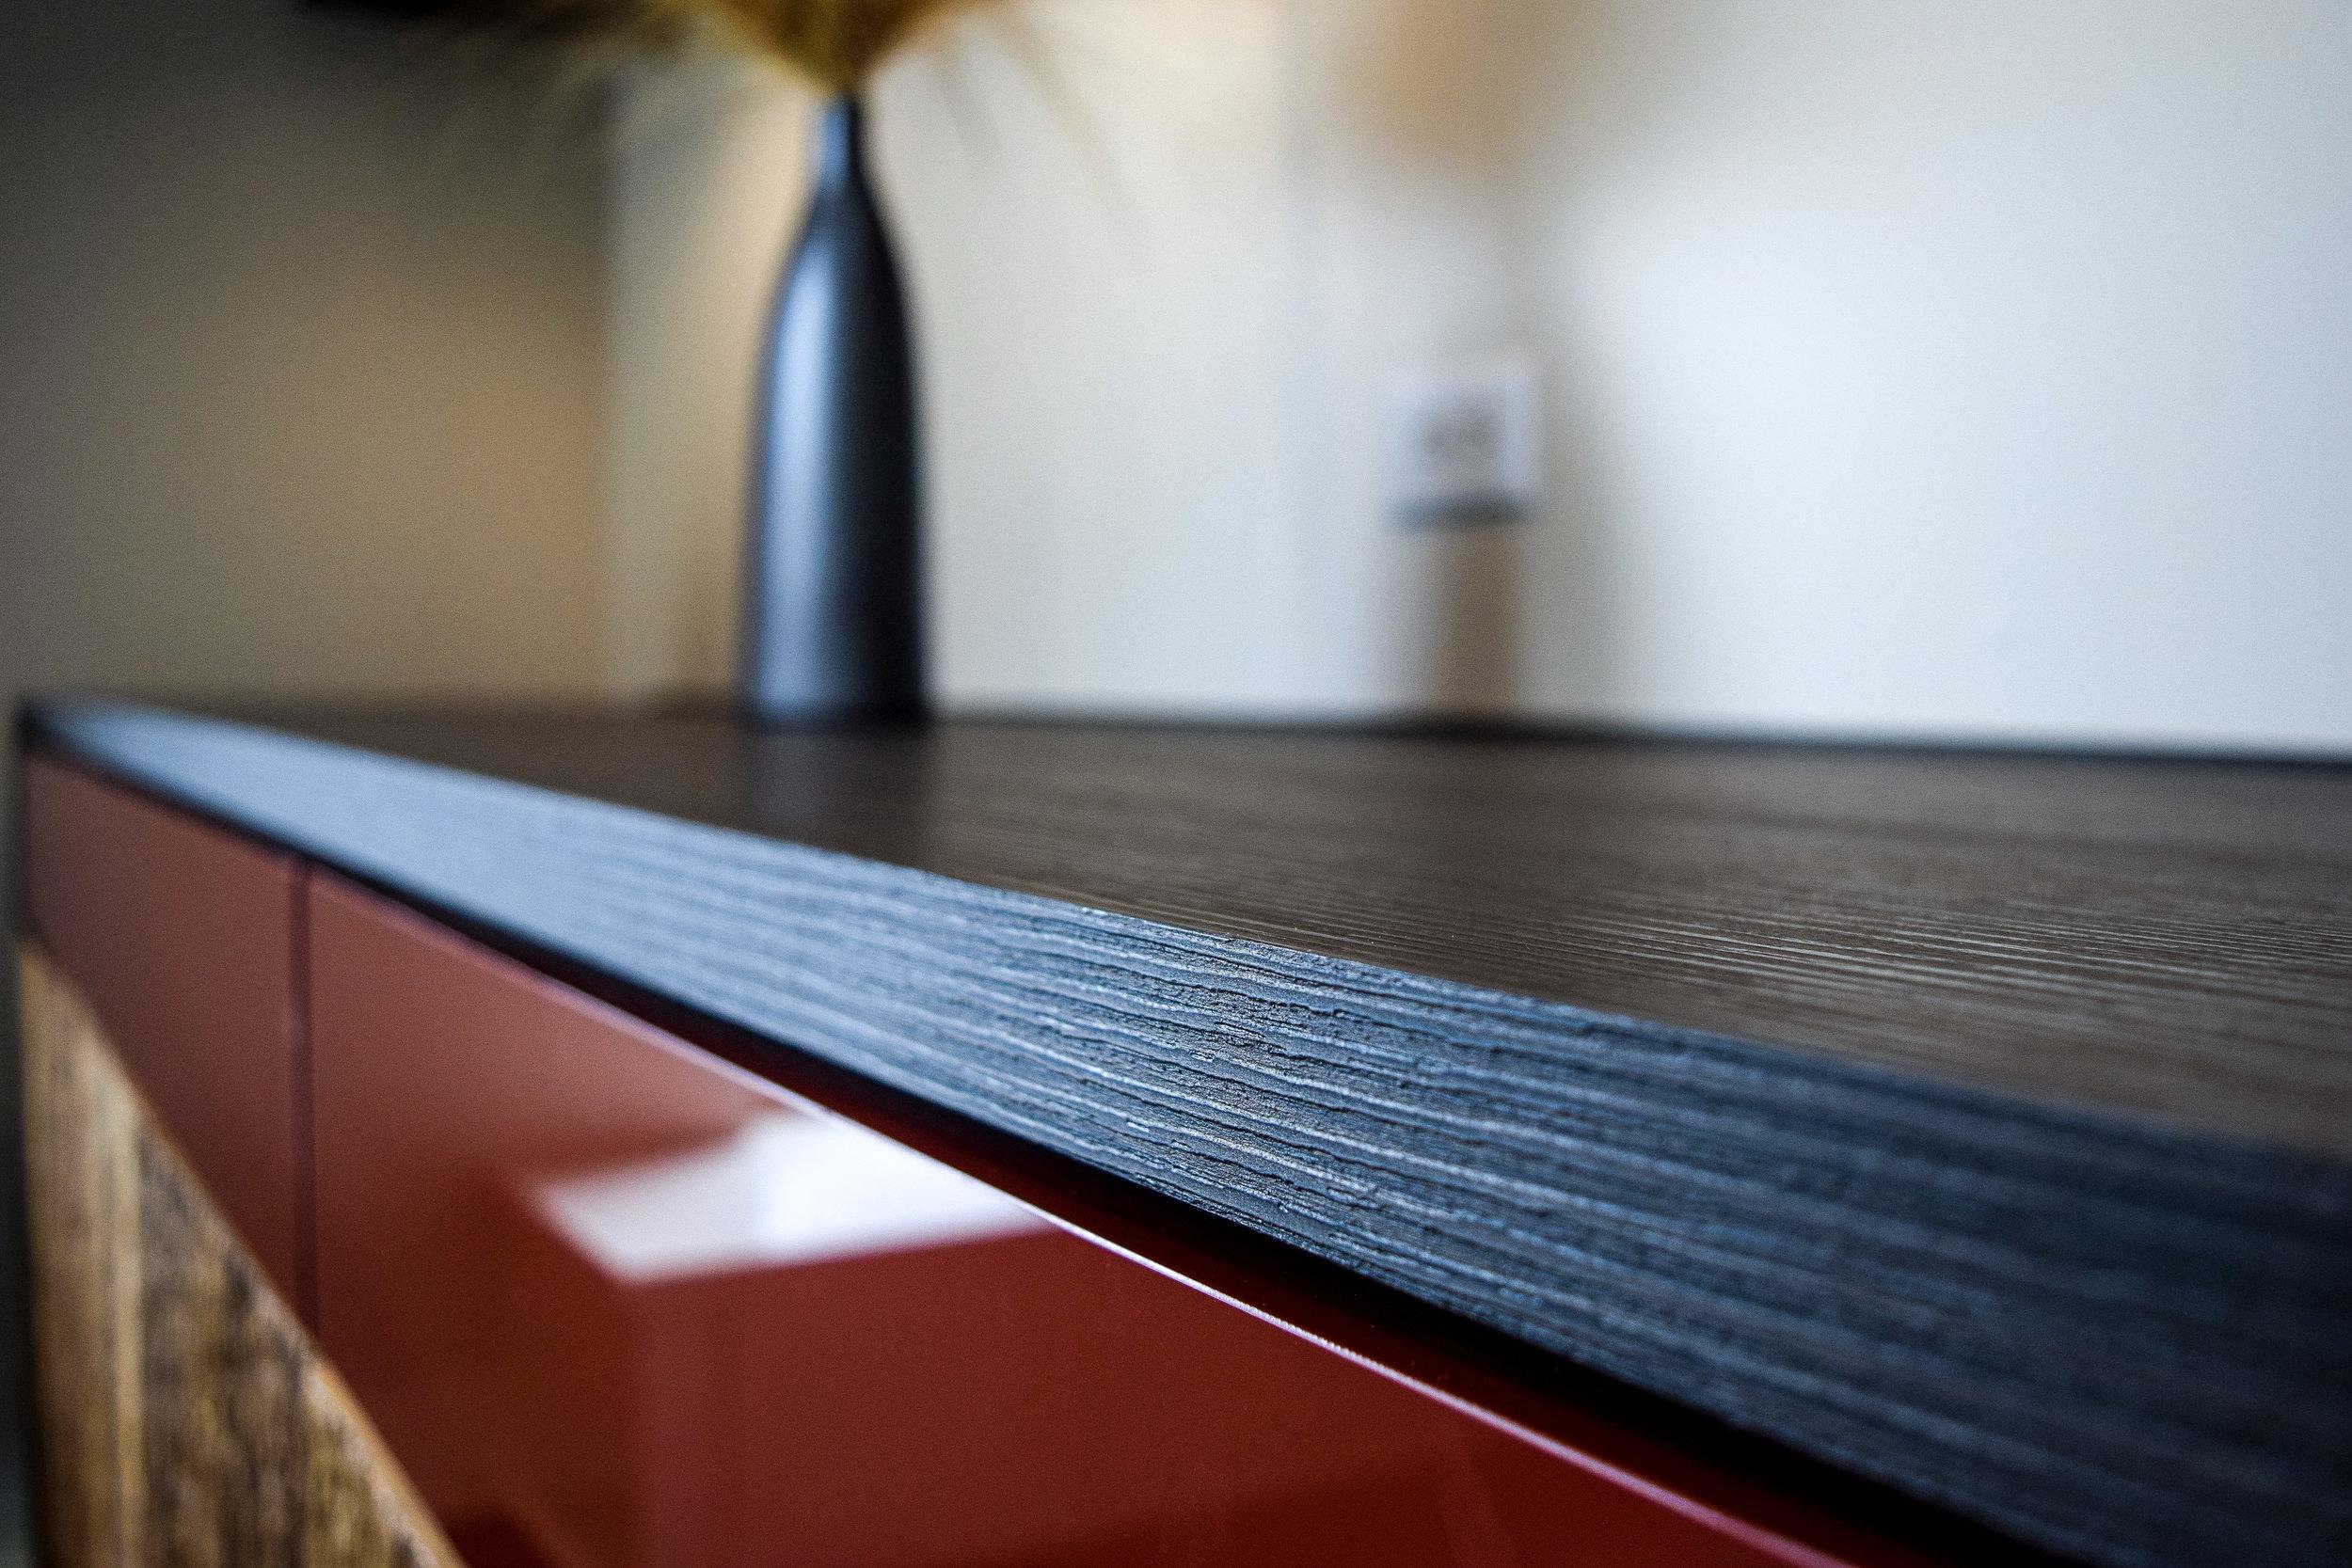 Floor unit Countertop closeup_.jpg